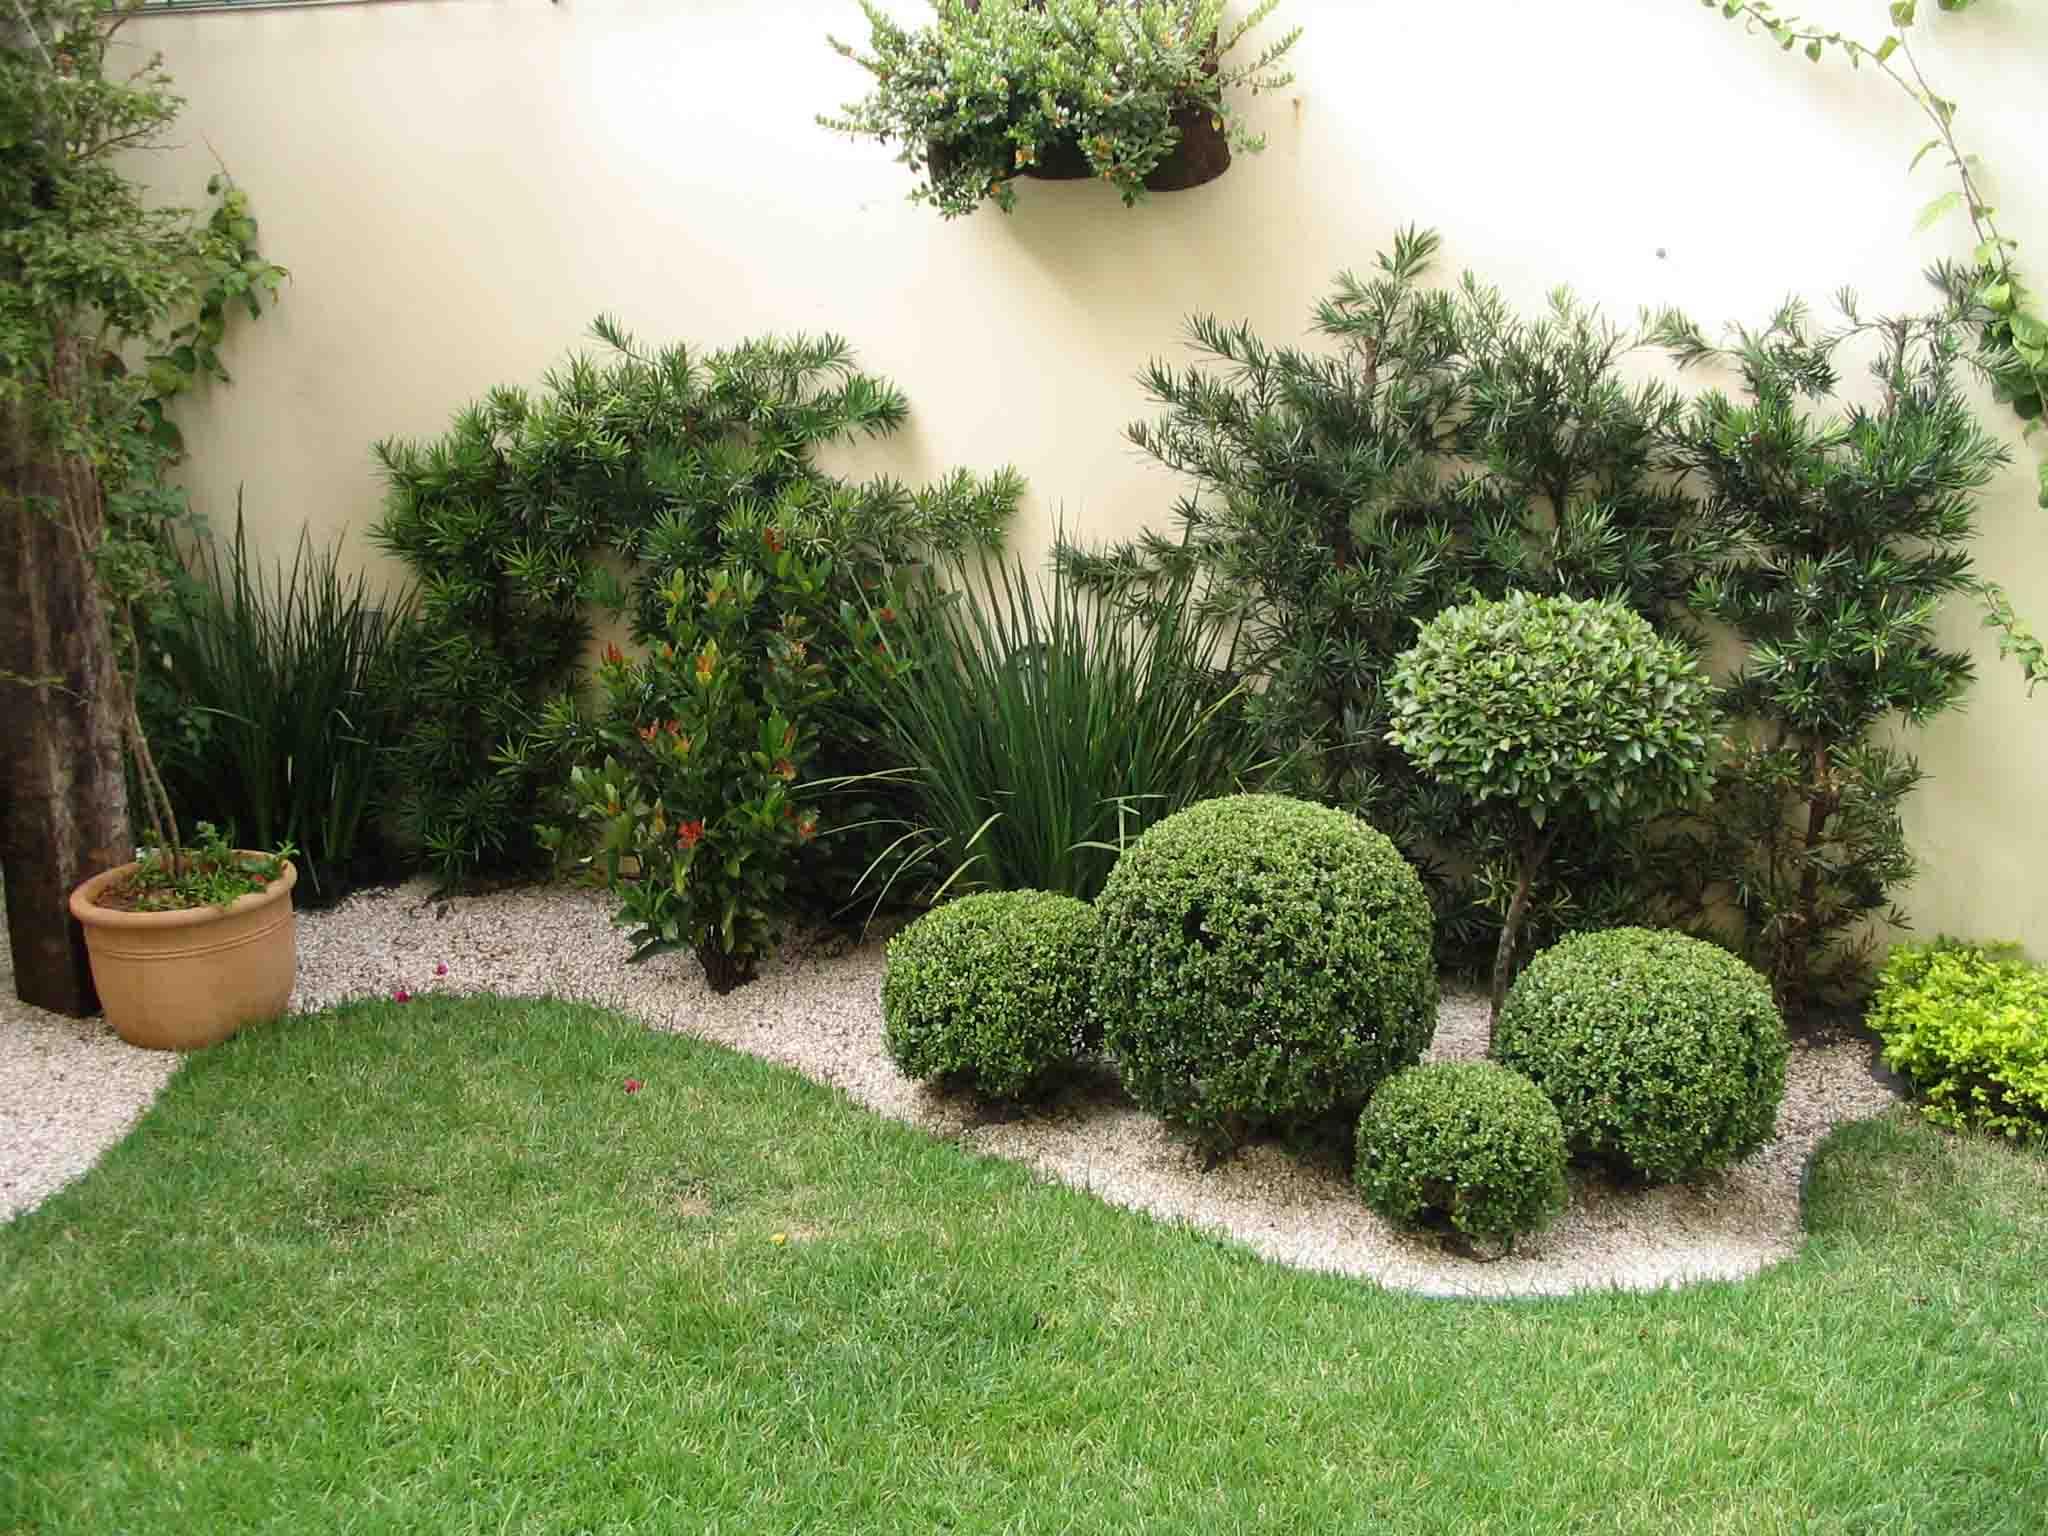 plantas jardim pequeno:Decoracao De Jardim Pequeno